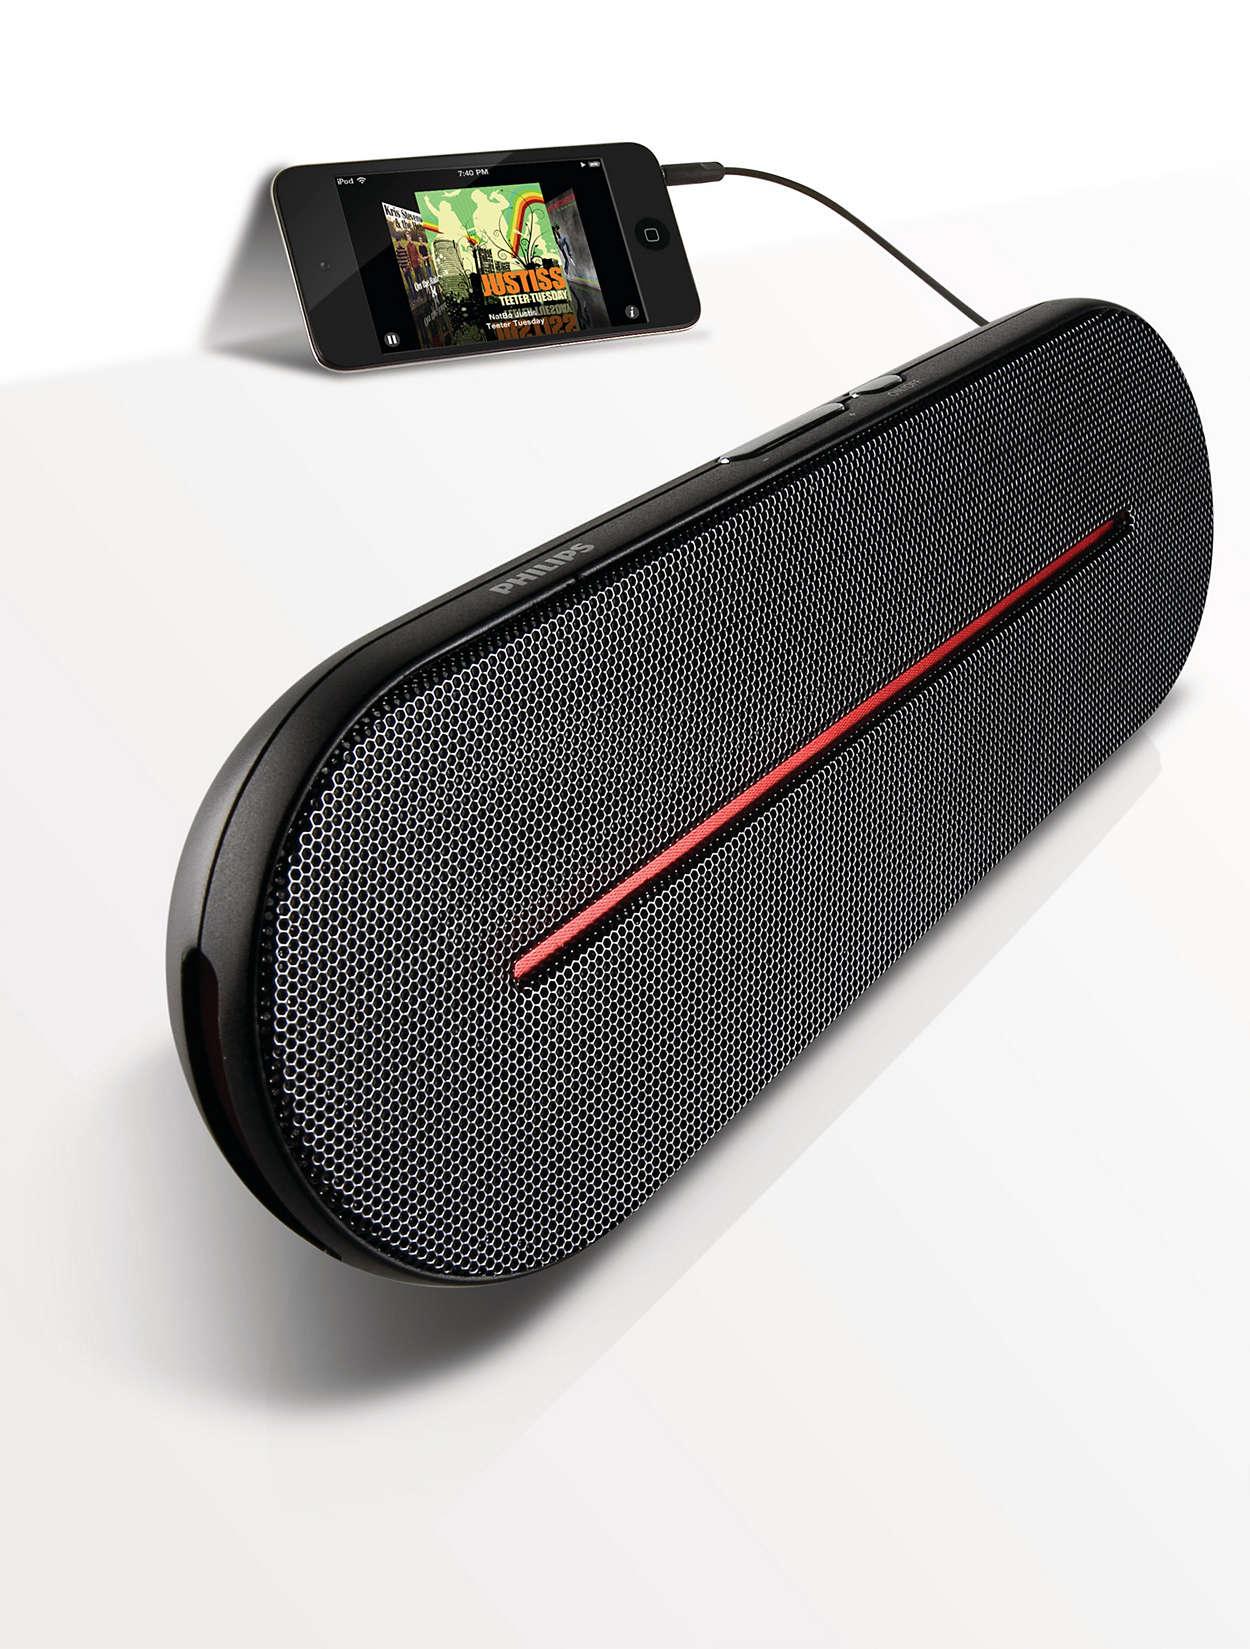 Prenosný stereofonický zvuk vysokej kvality